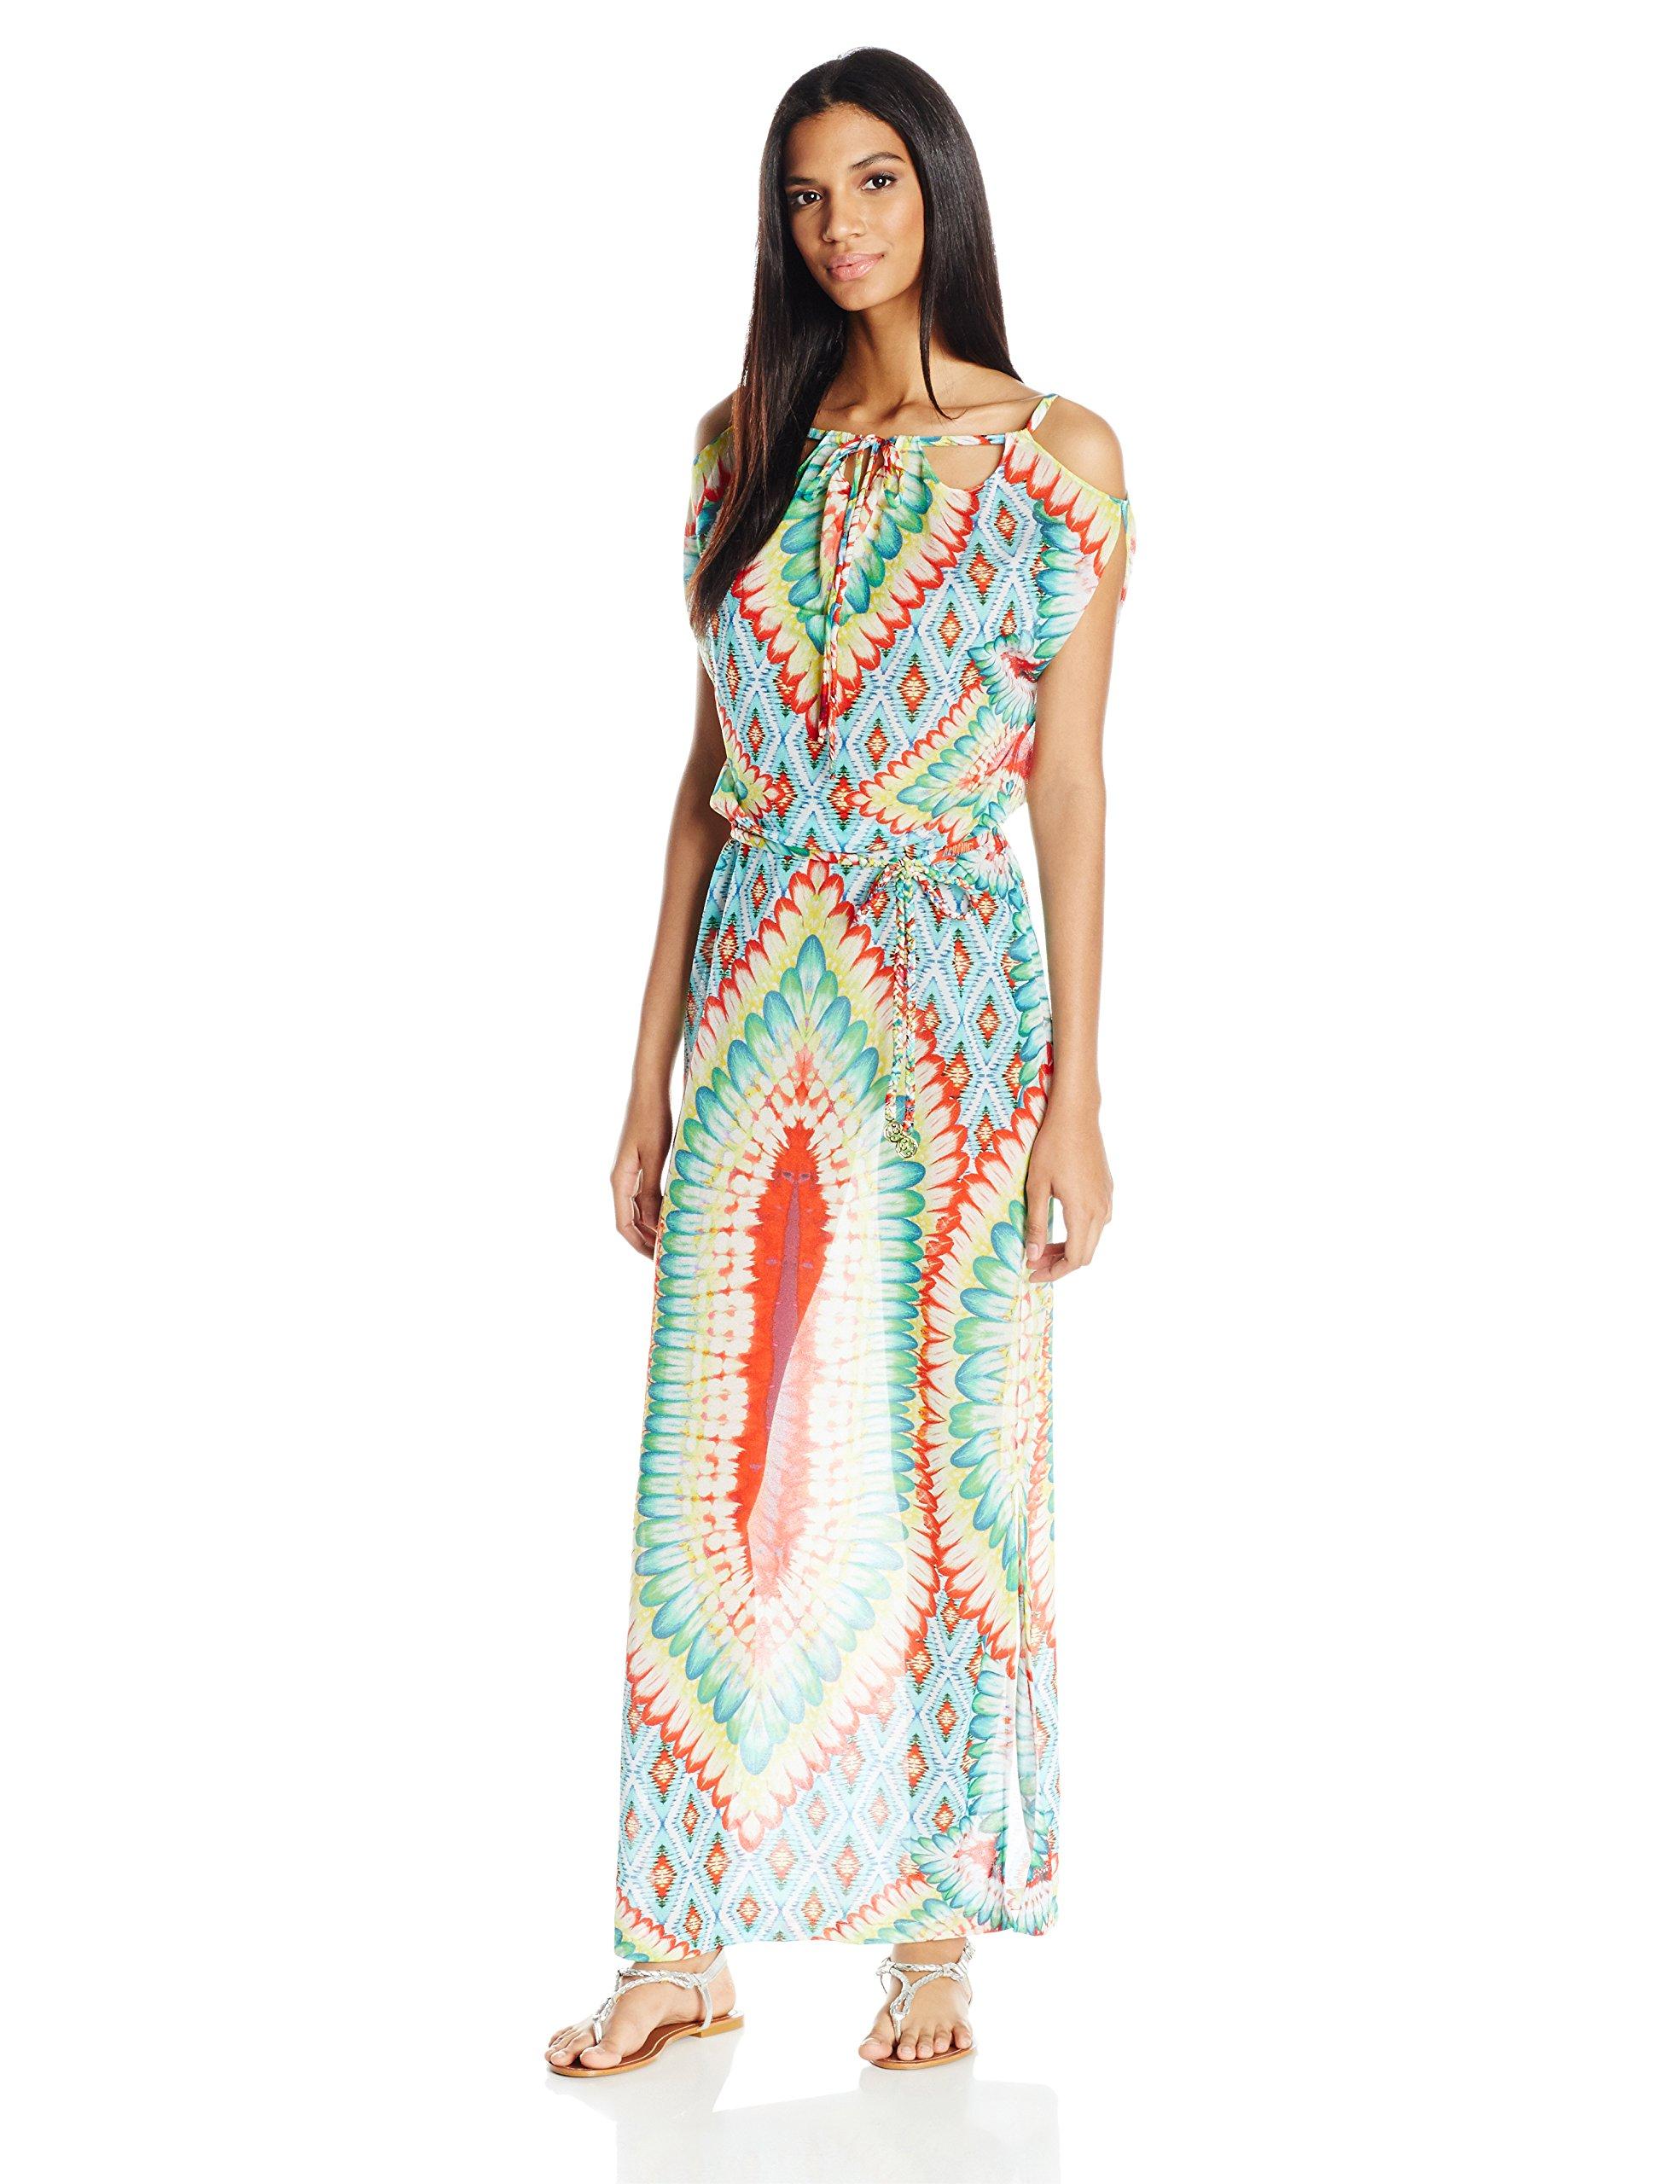 Luli Fama Women's Wild Heart Island Dress Cover up, Multi, XS/S